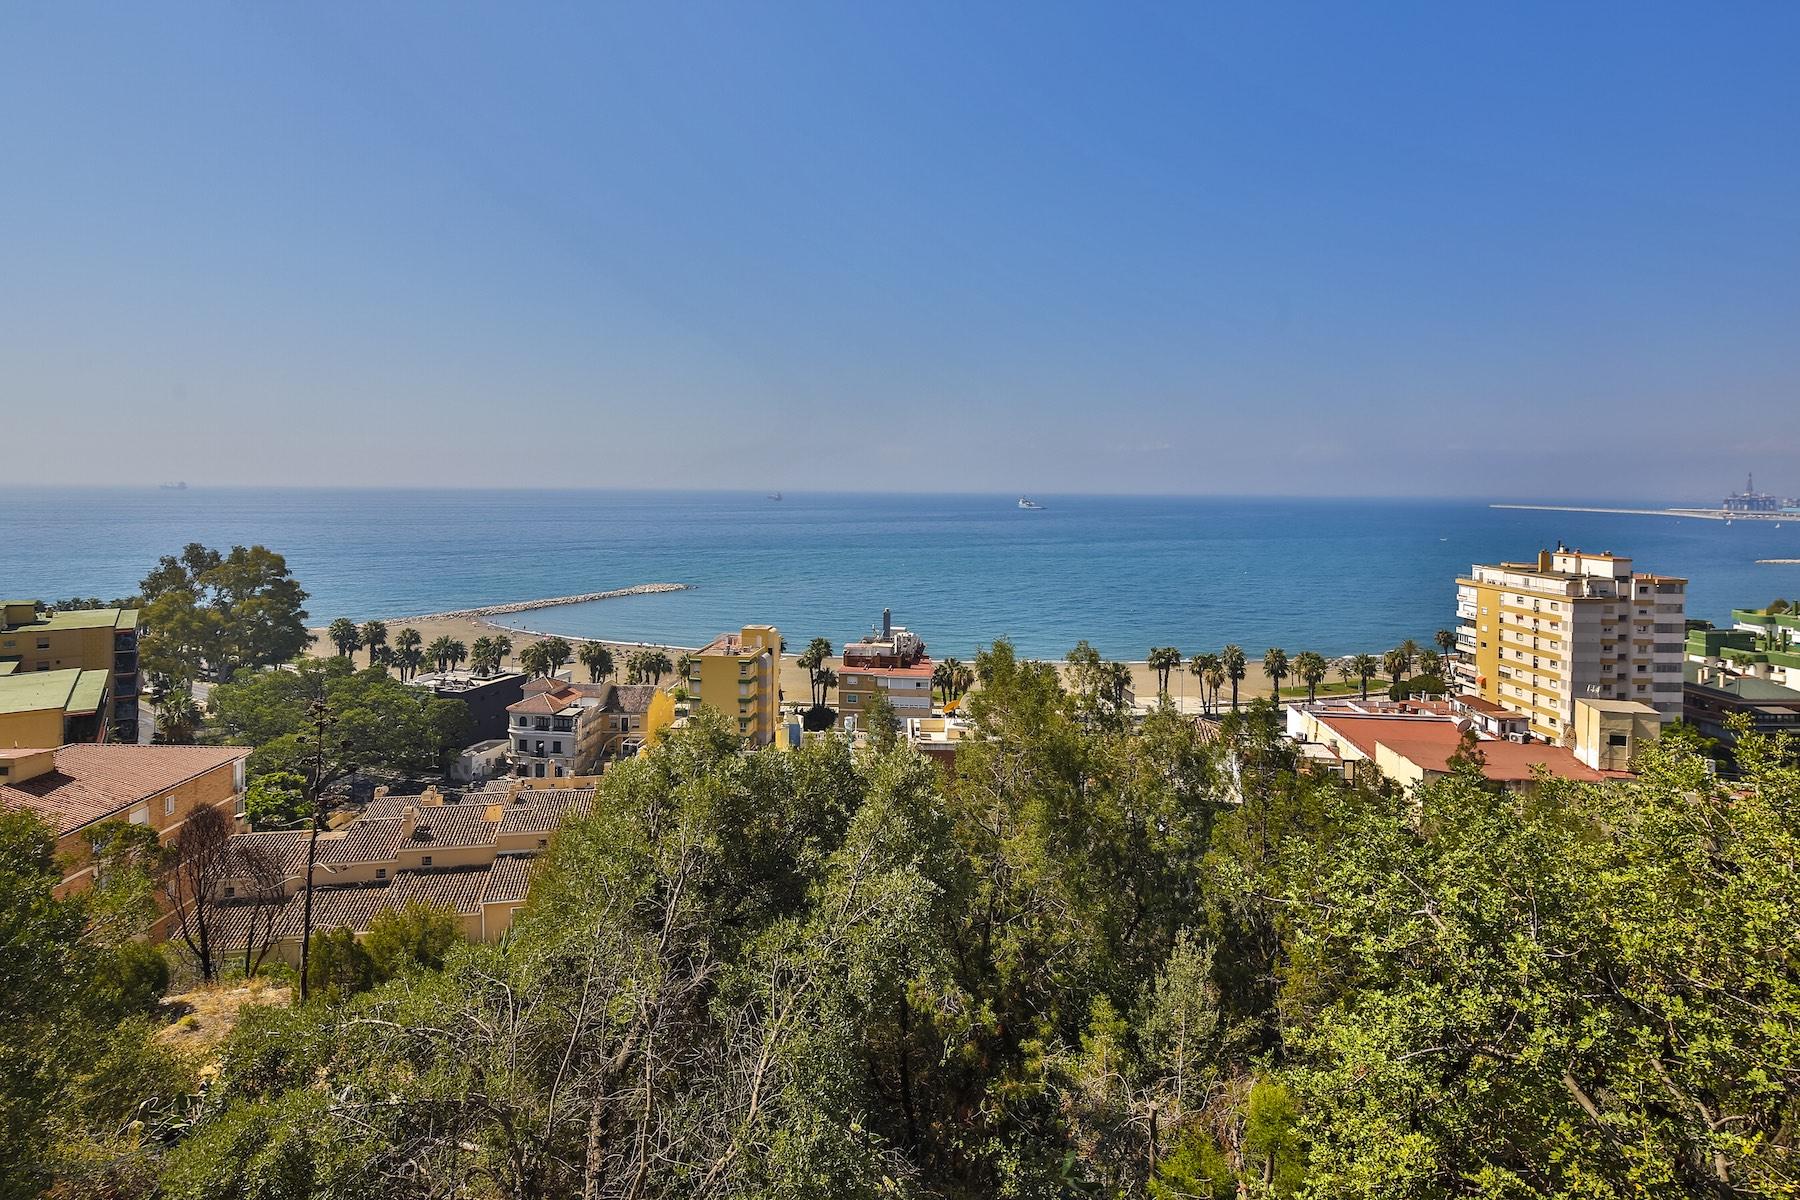 独户住宅 为 销售 在 Spectacular palatial castle with breathtaking sea and coastline views. 马拉加, 安达卢西亚, 西班牙